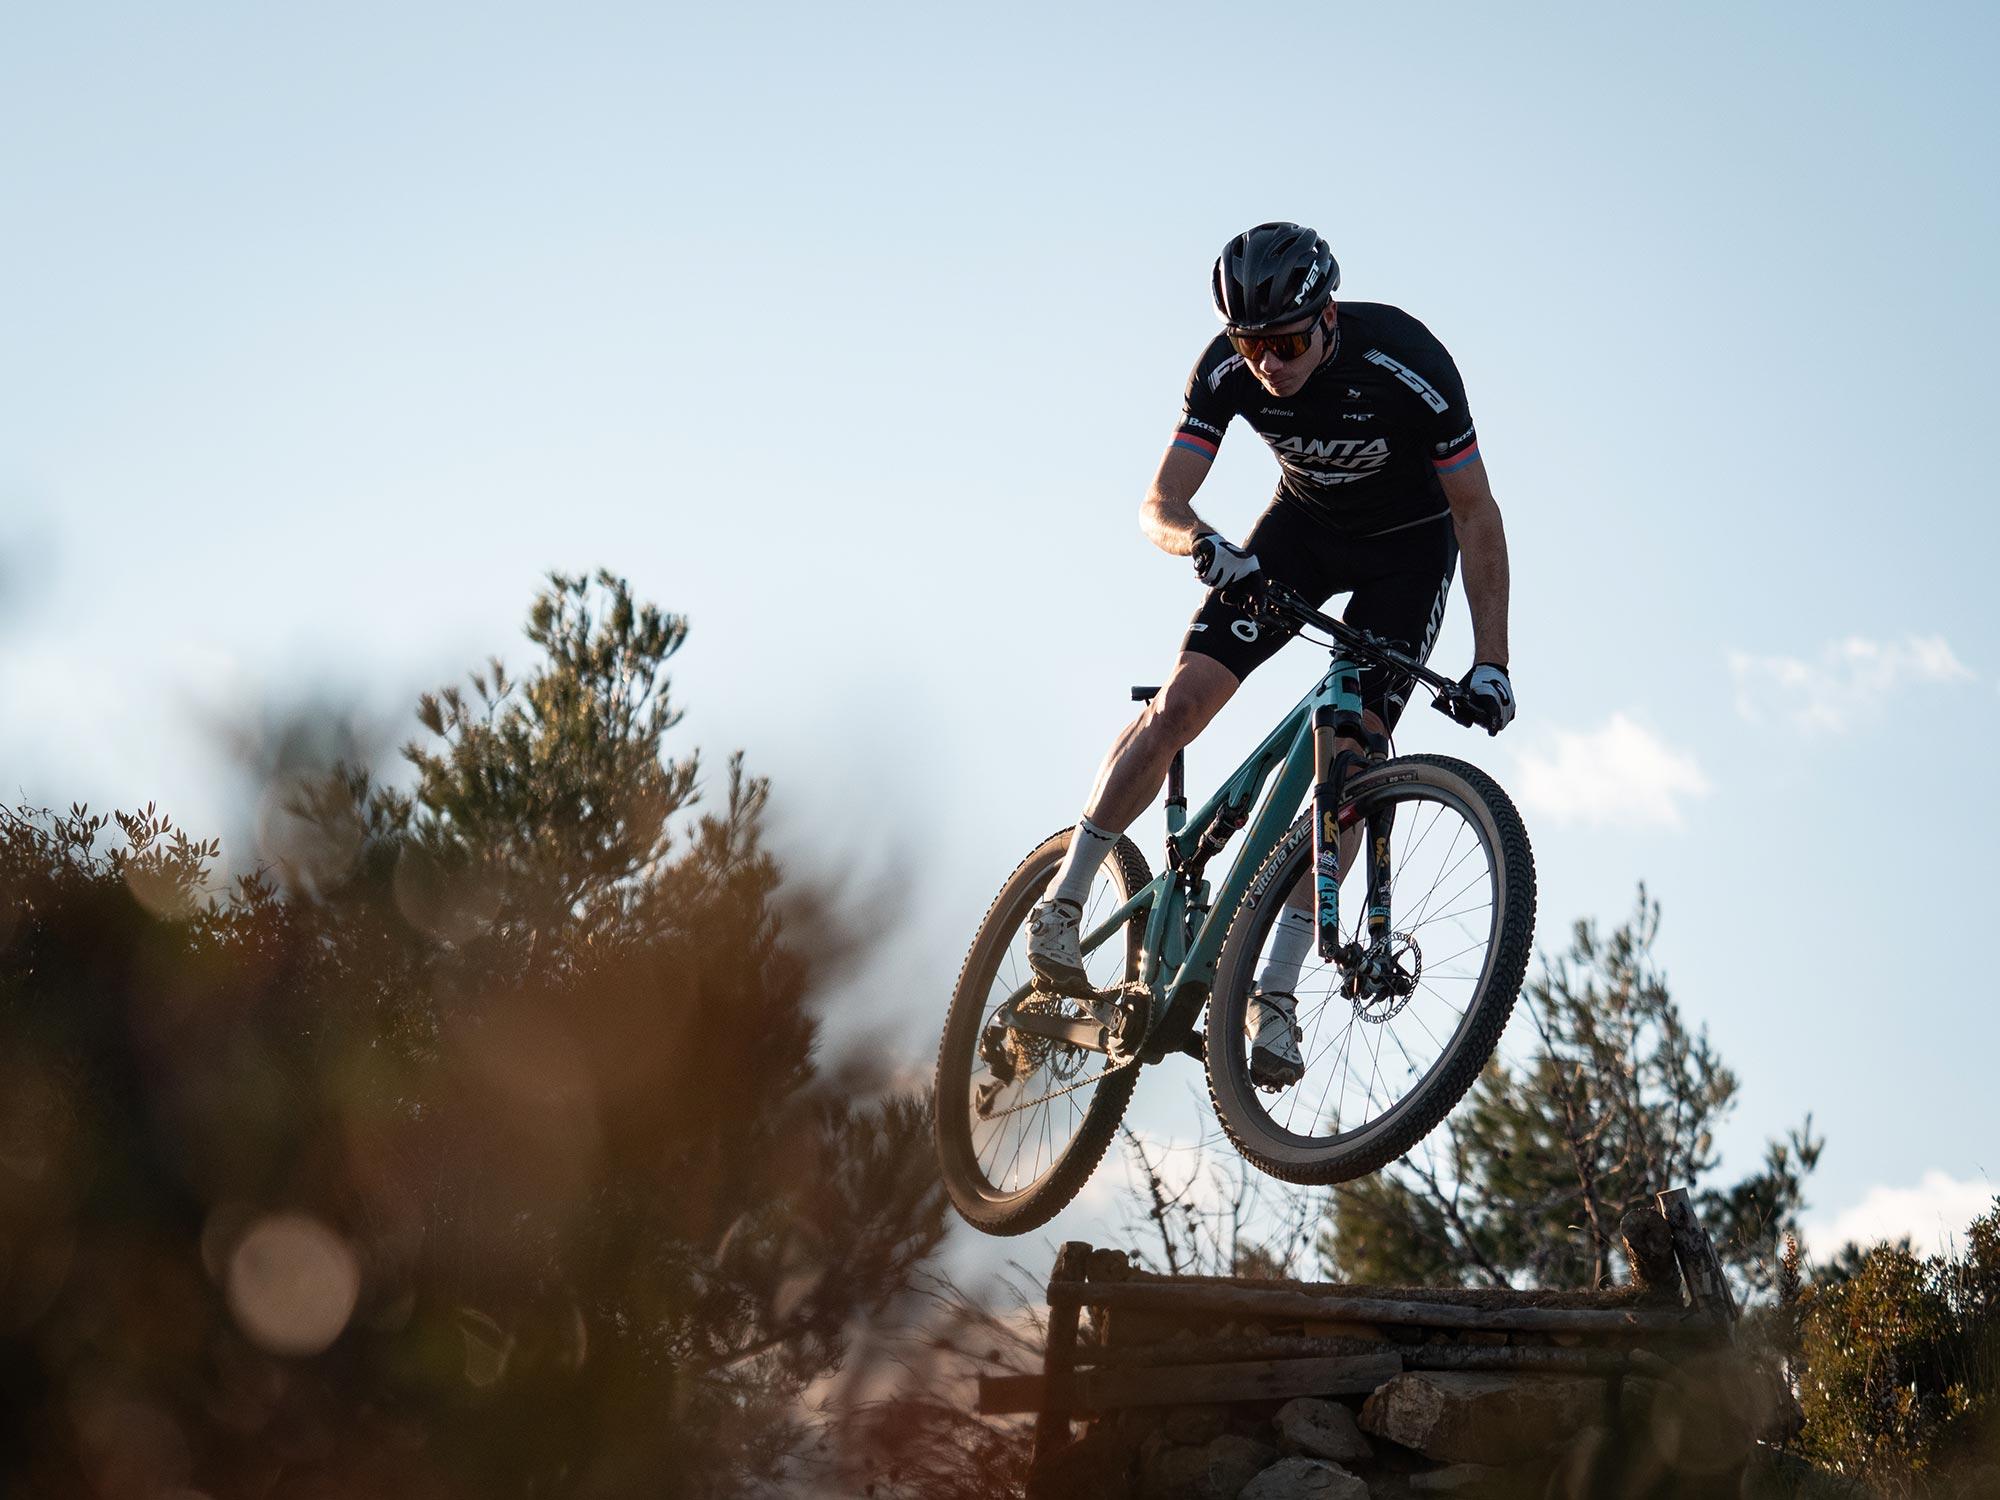 Maxime Marotte Santa Cruz FSA Cross Country Team with MET Trenta Mips